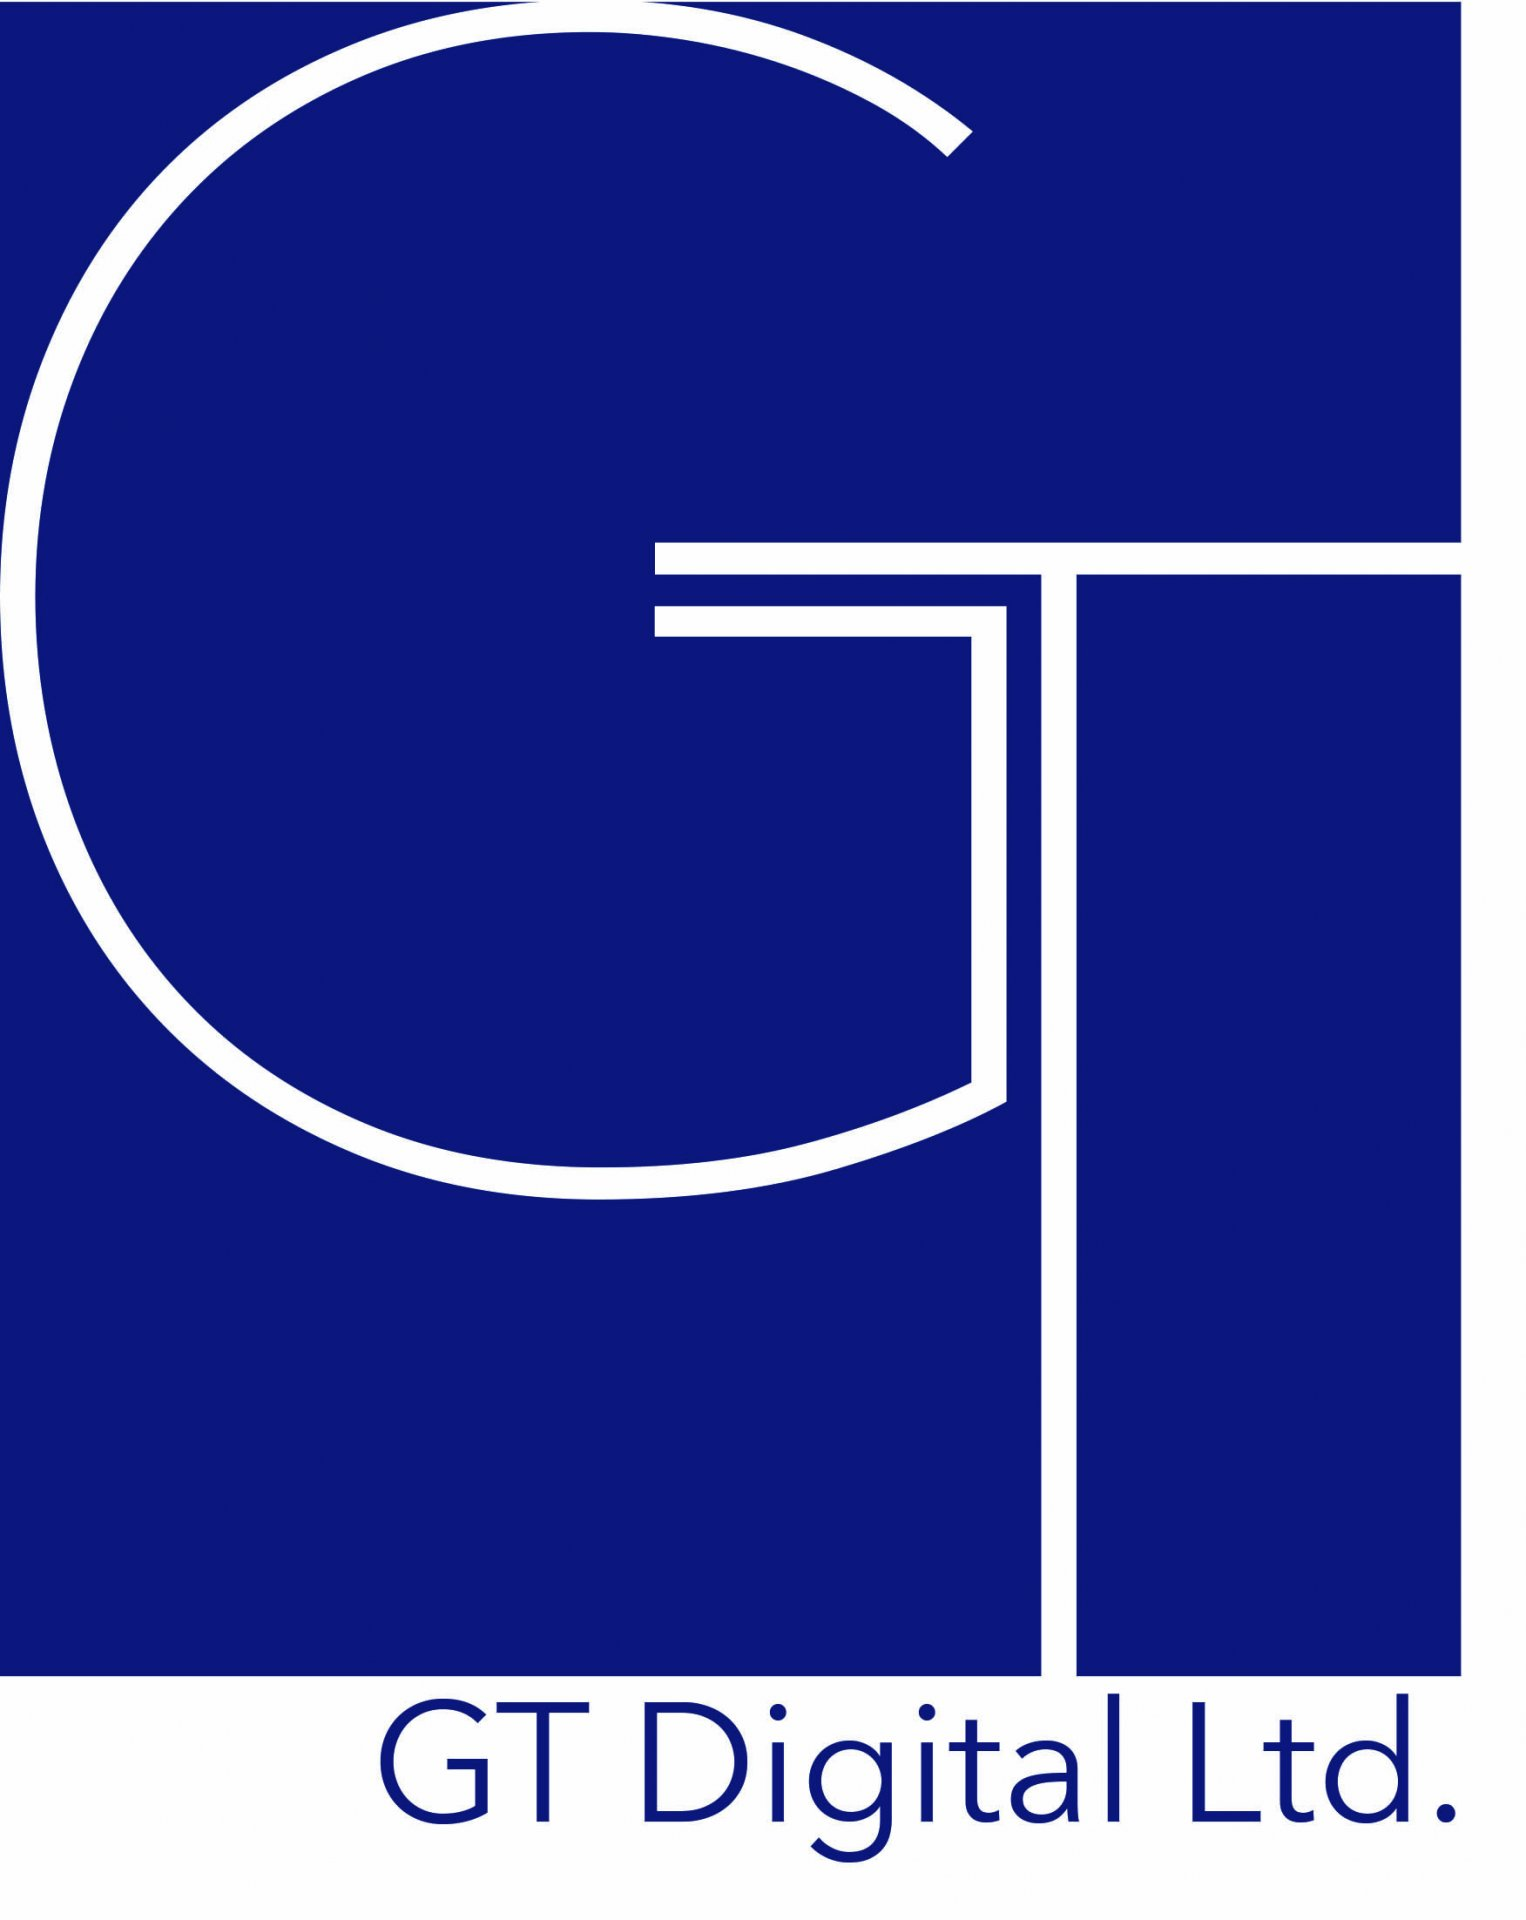 GT Digital